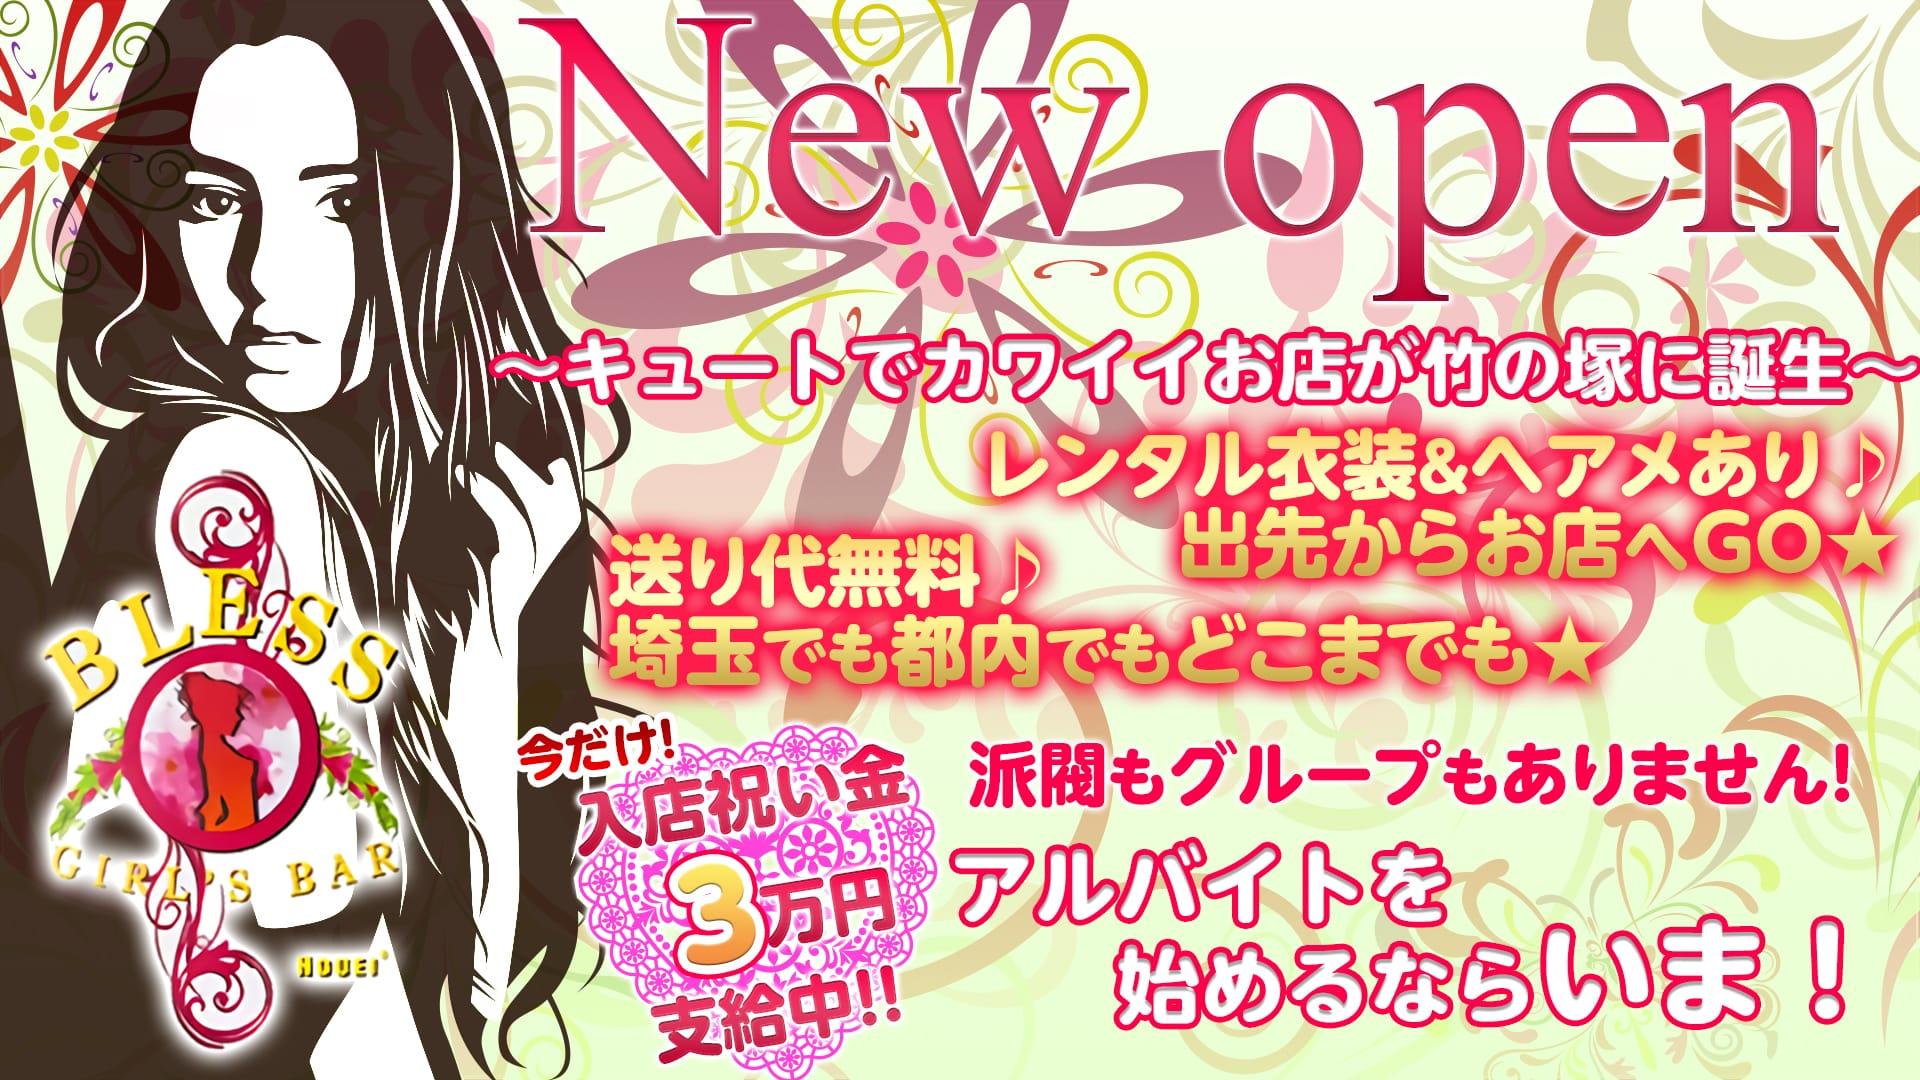 GIRL'S BAR BLESS(ブレス) 北千住ガールズバー TOP画像